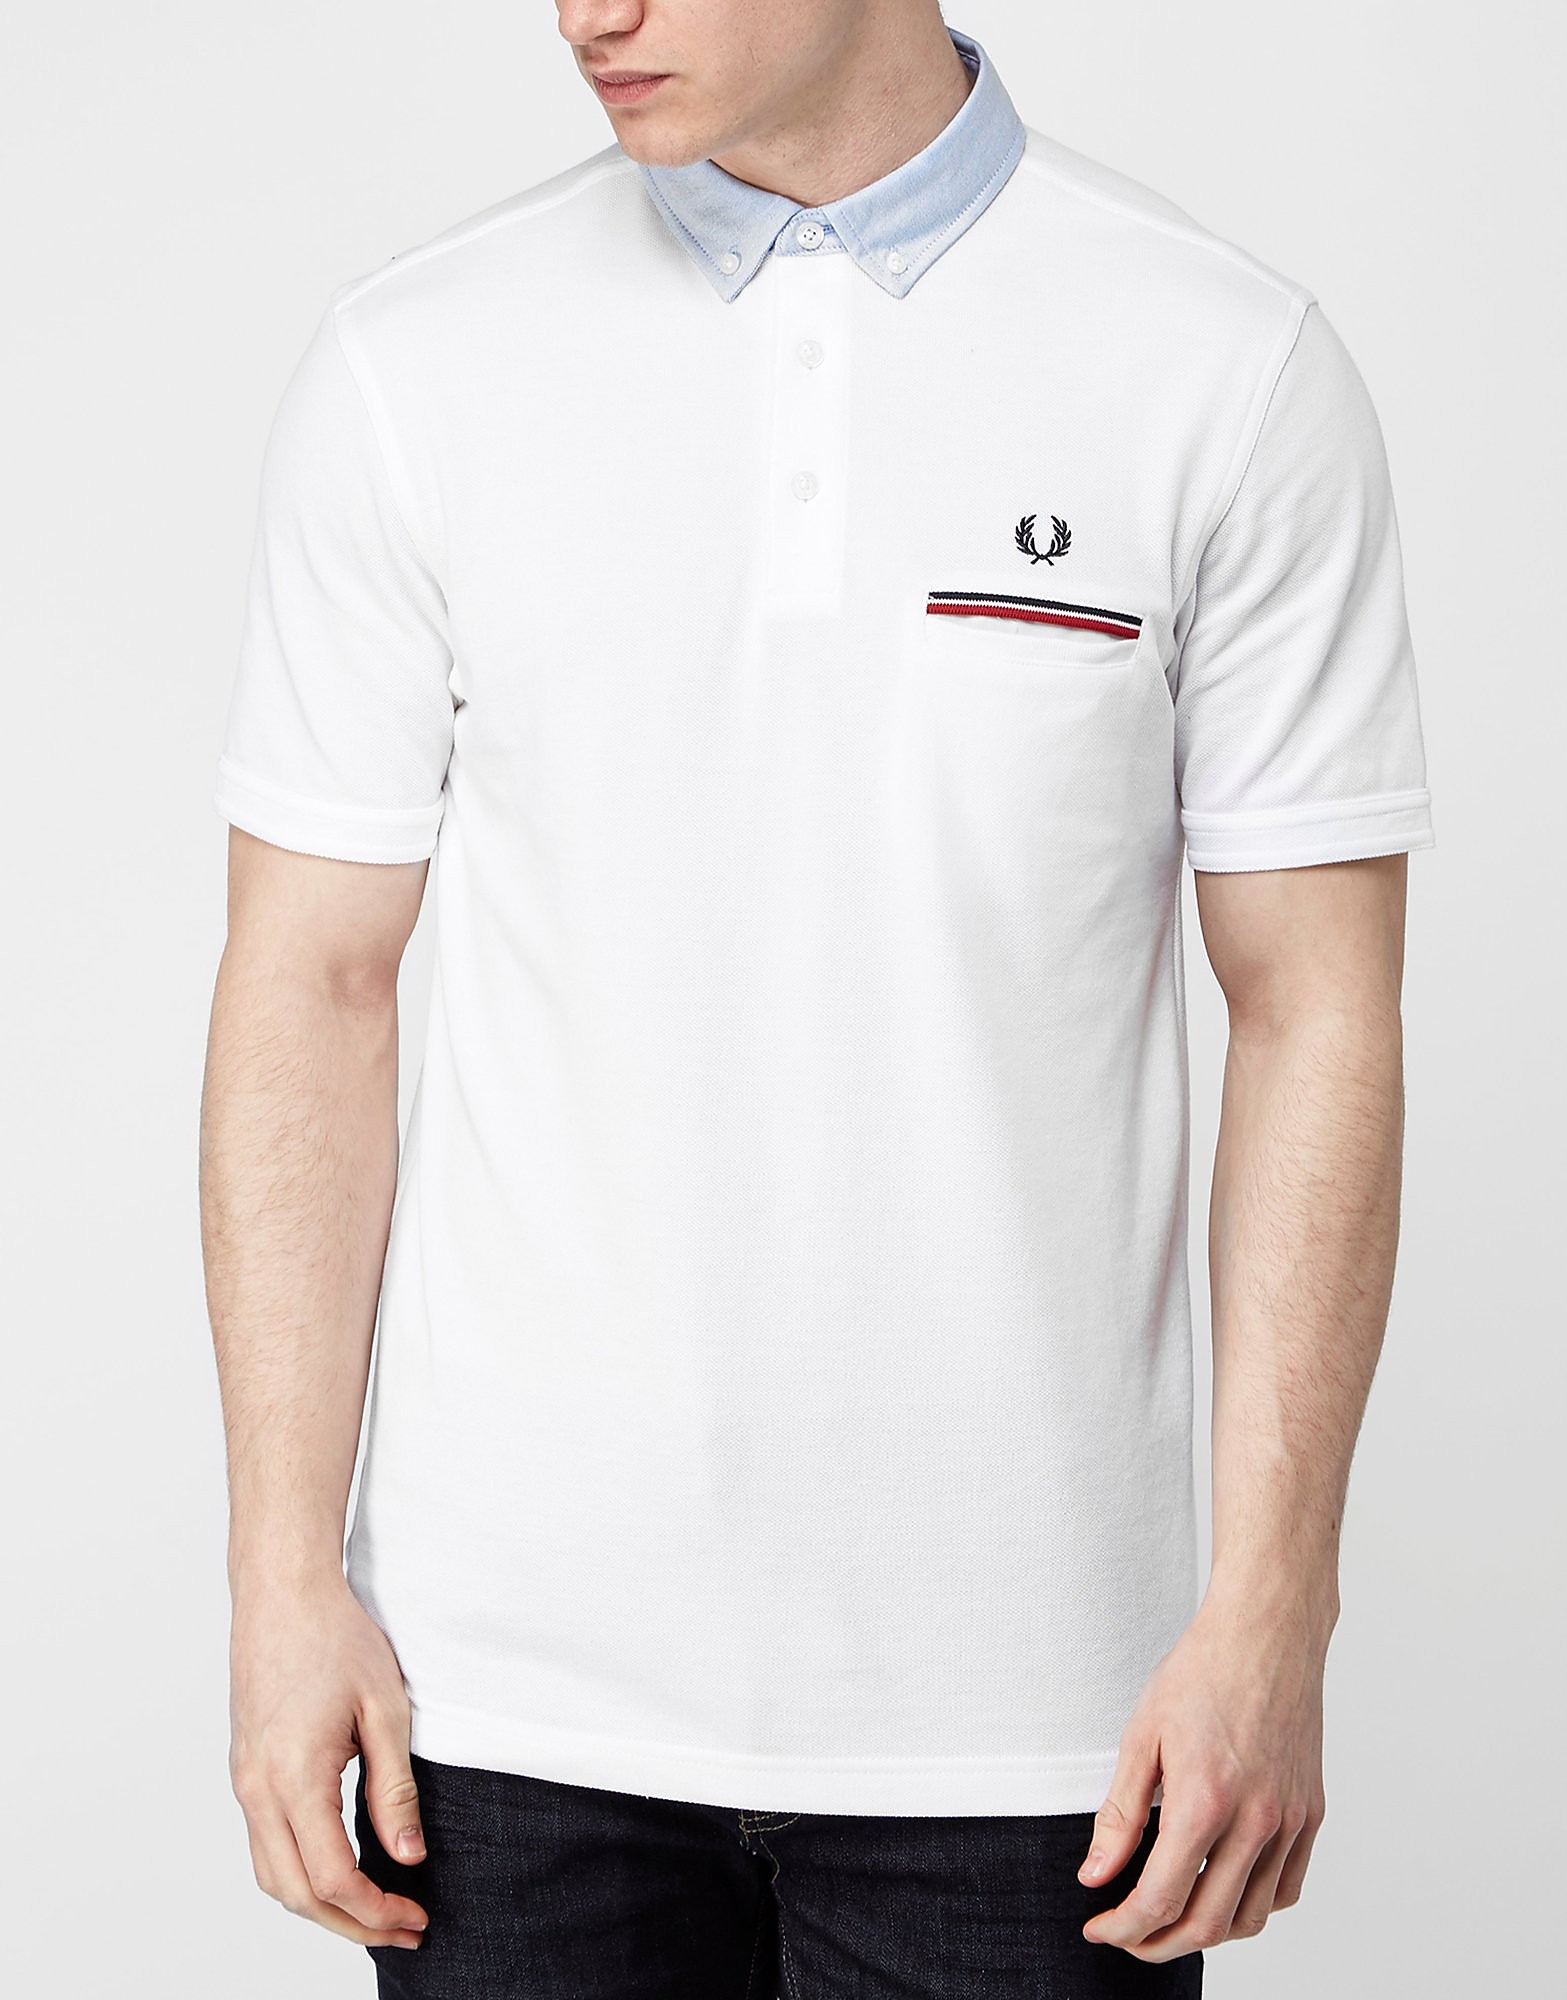 Fred Perry Woven Collar Oxford Polo Shirt  WhiteBlue WhiteBlue